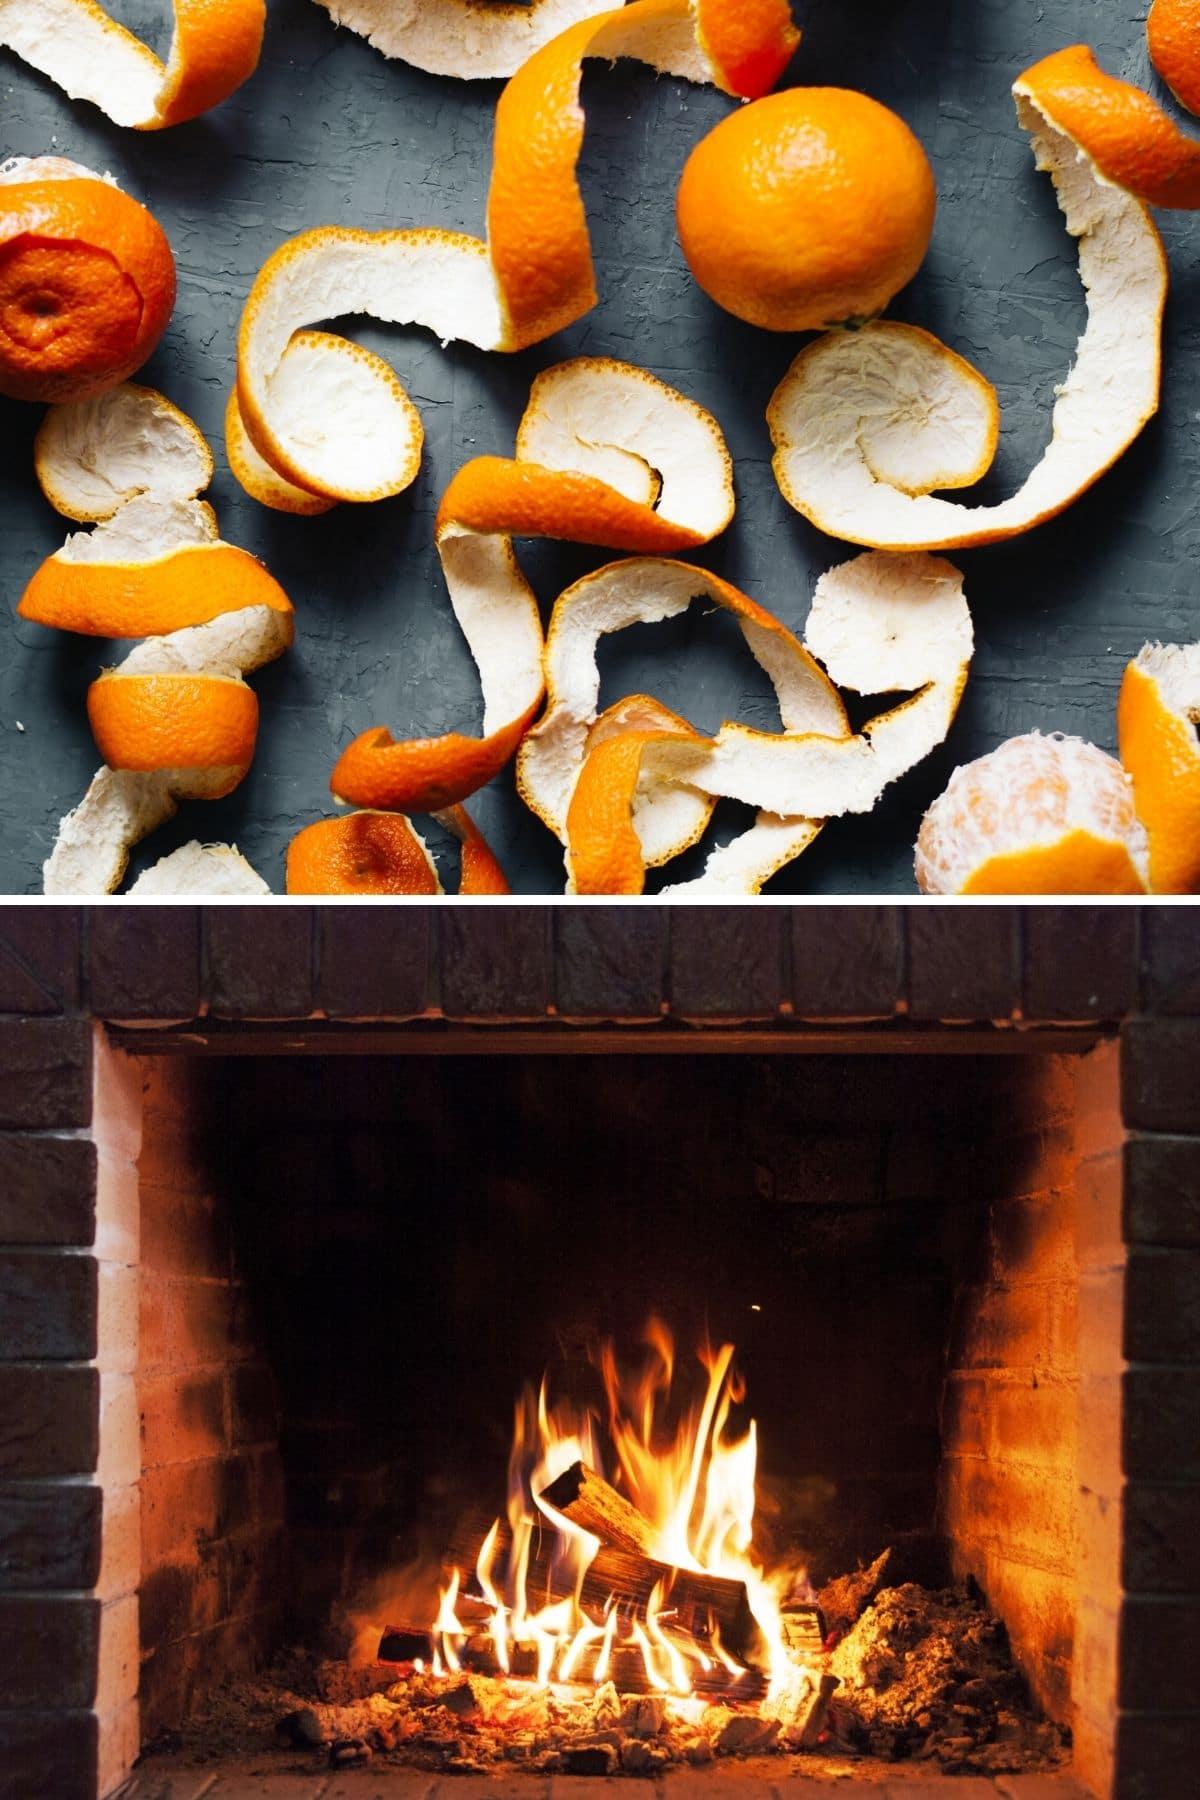 Orange peels over fireplace